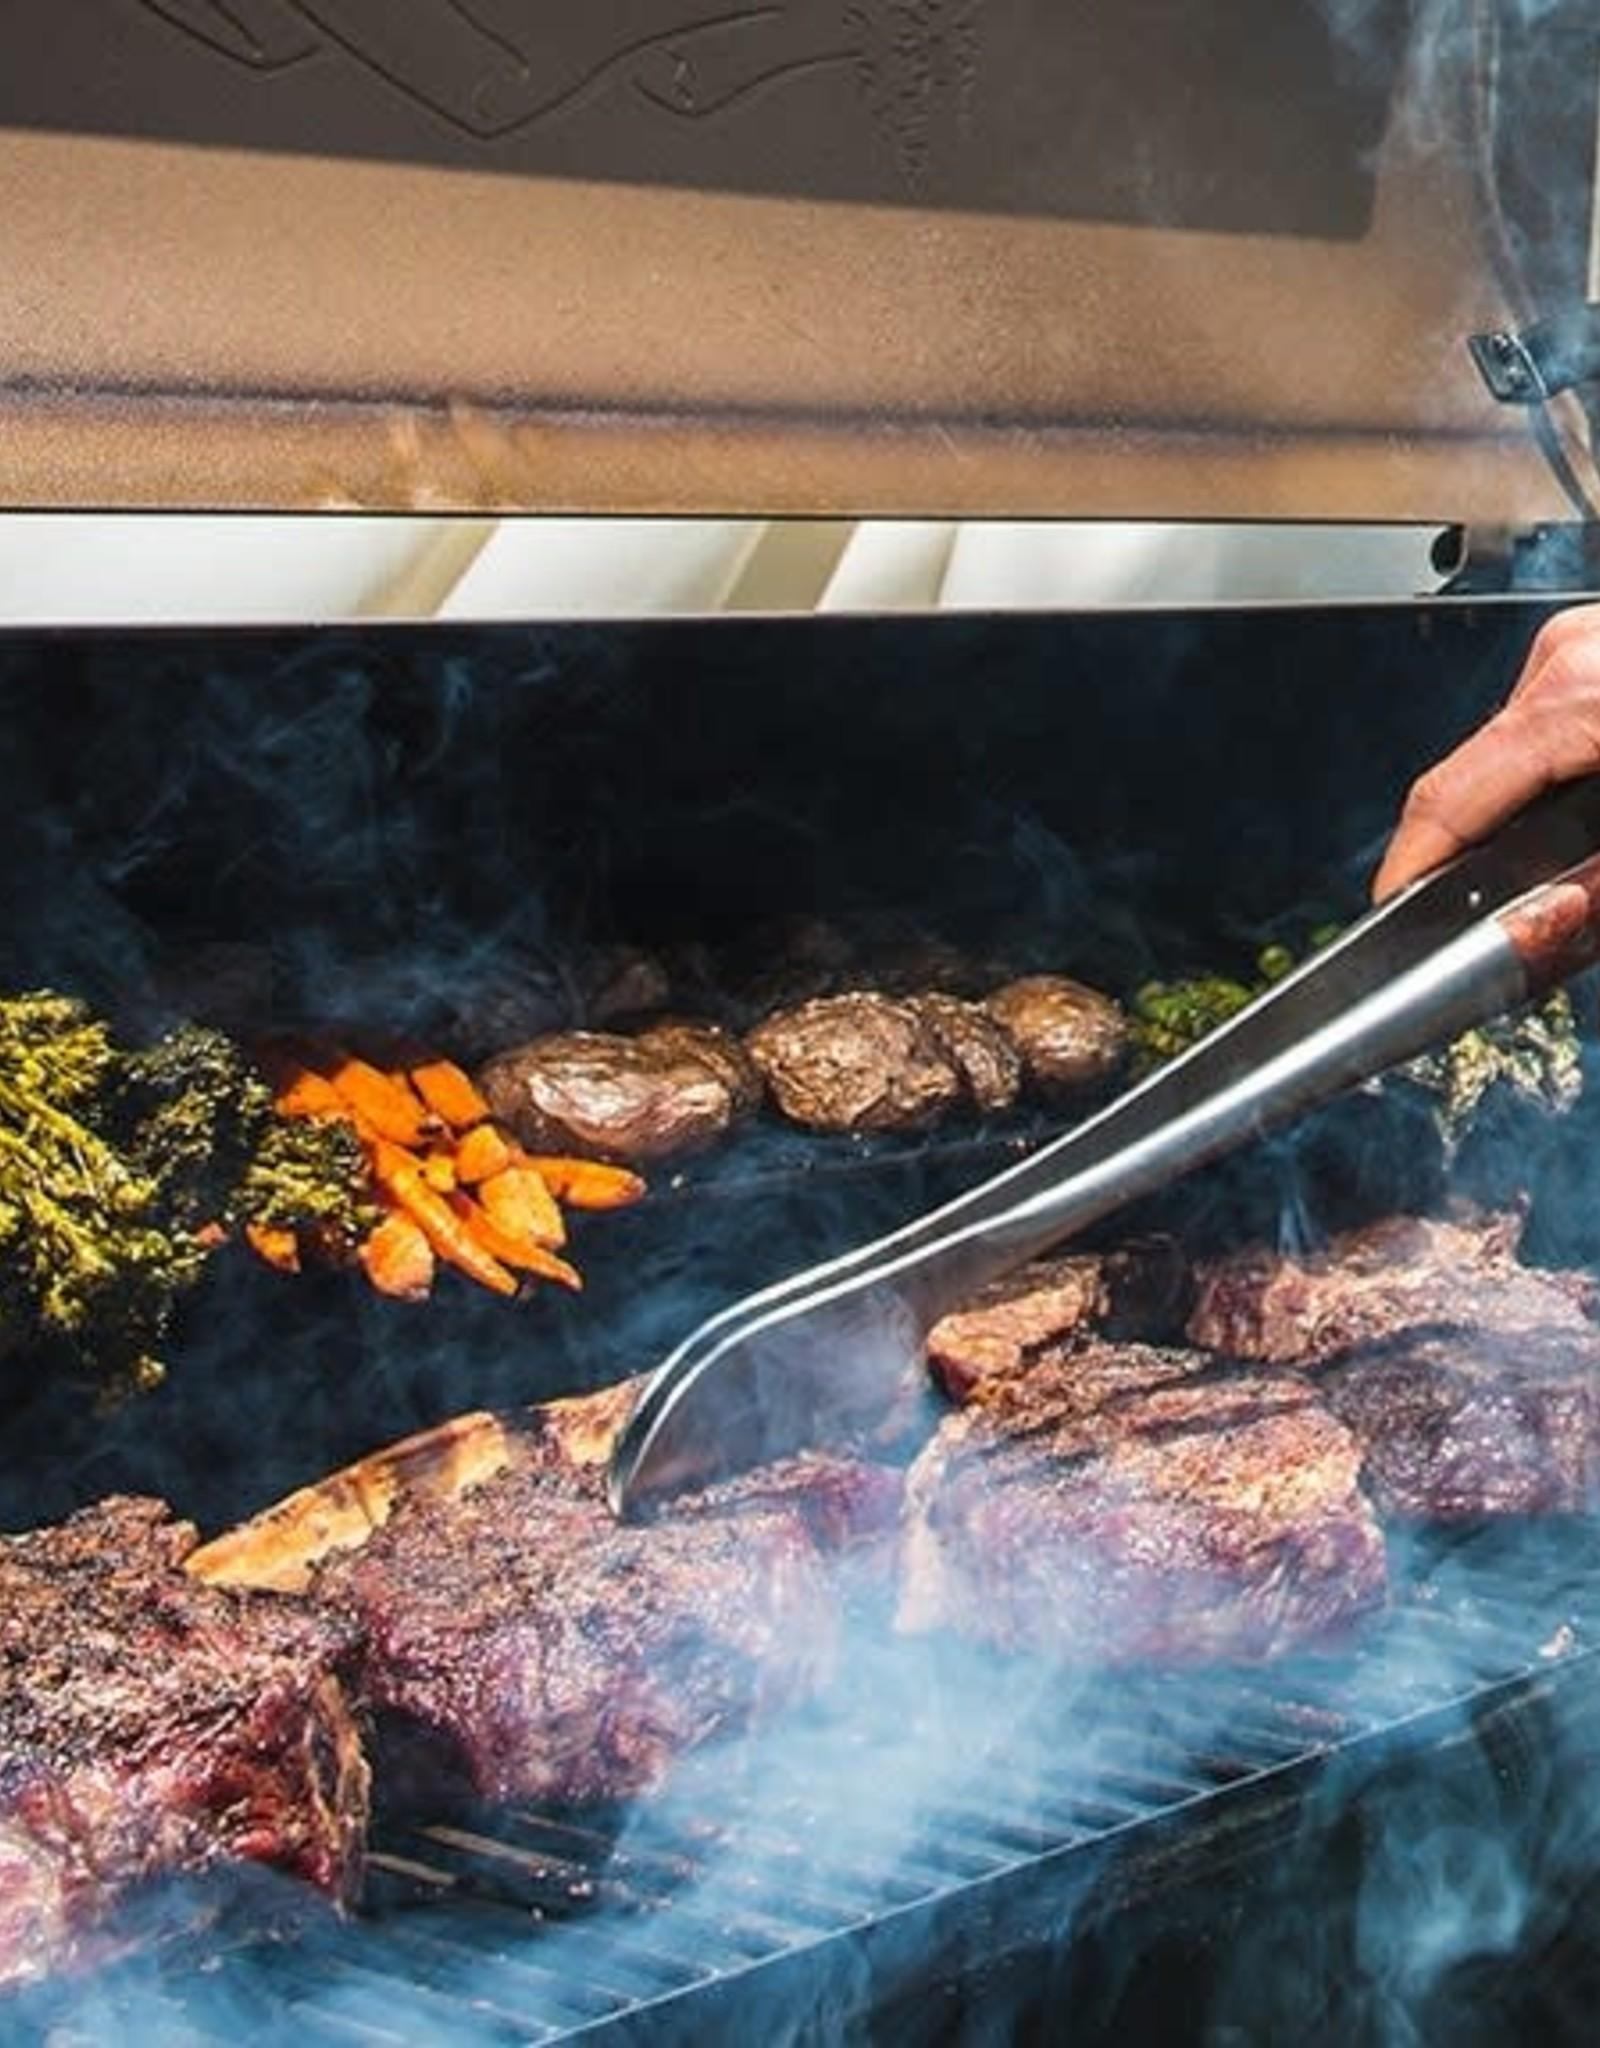 Traeger Traeger BBQ Grilling Tongs - BAC422